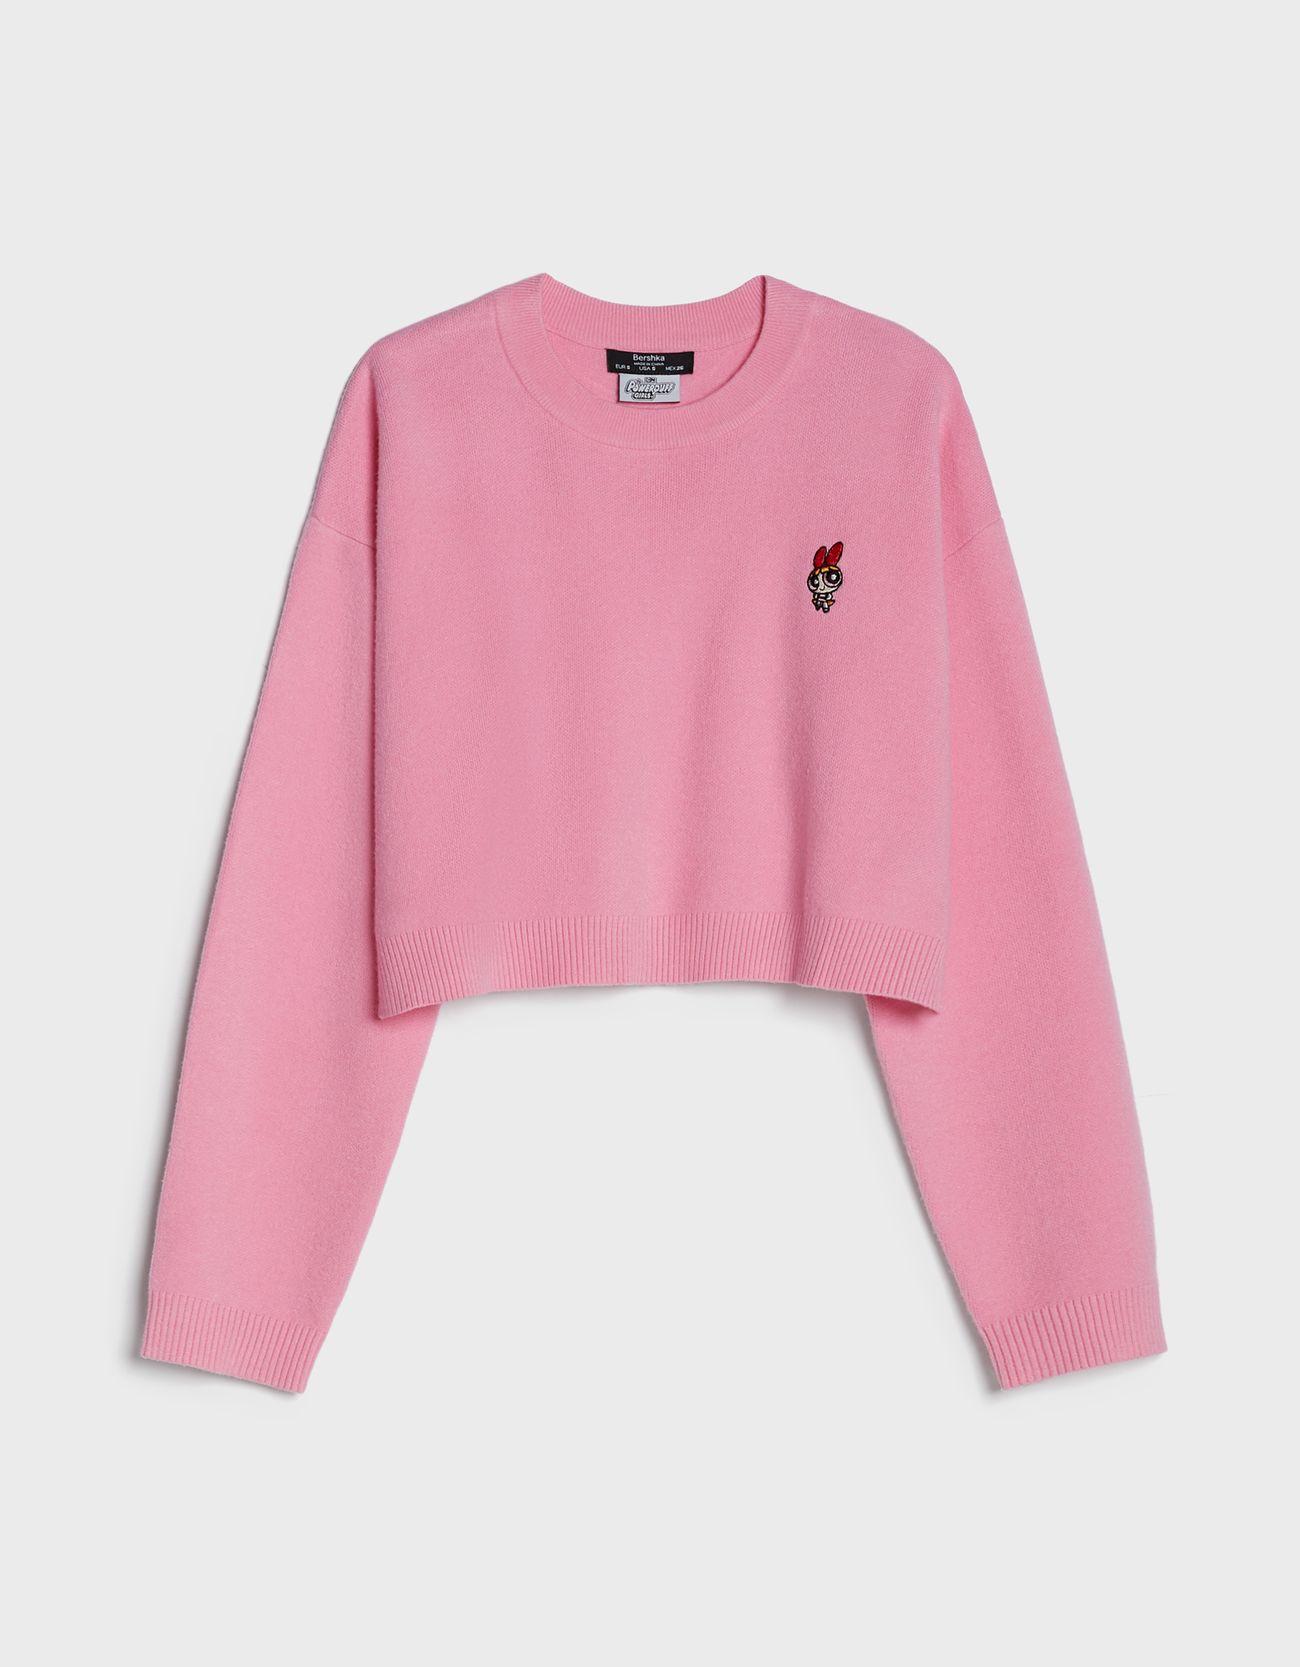 Jersey de punto cropped en rosa.